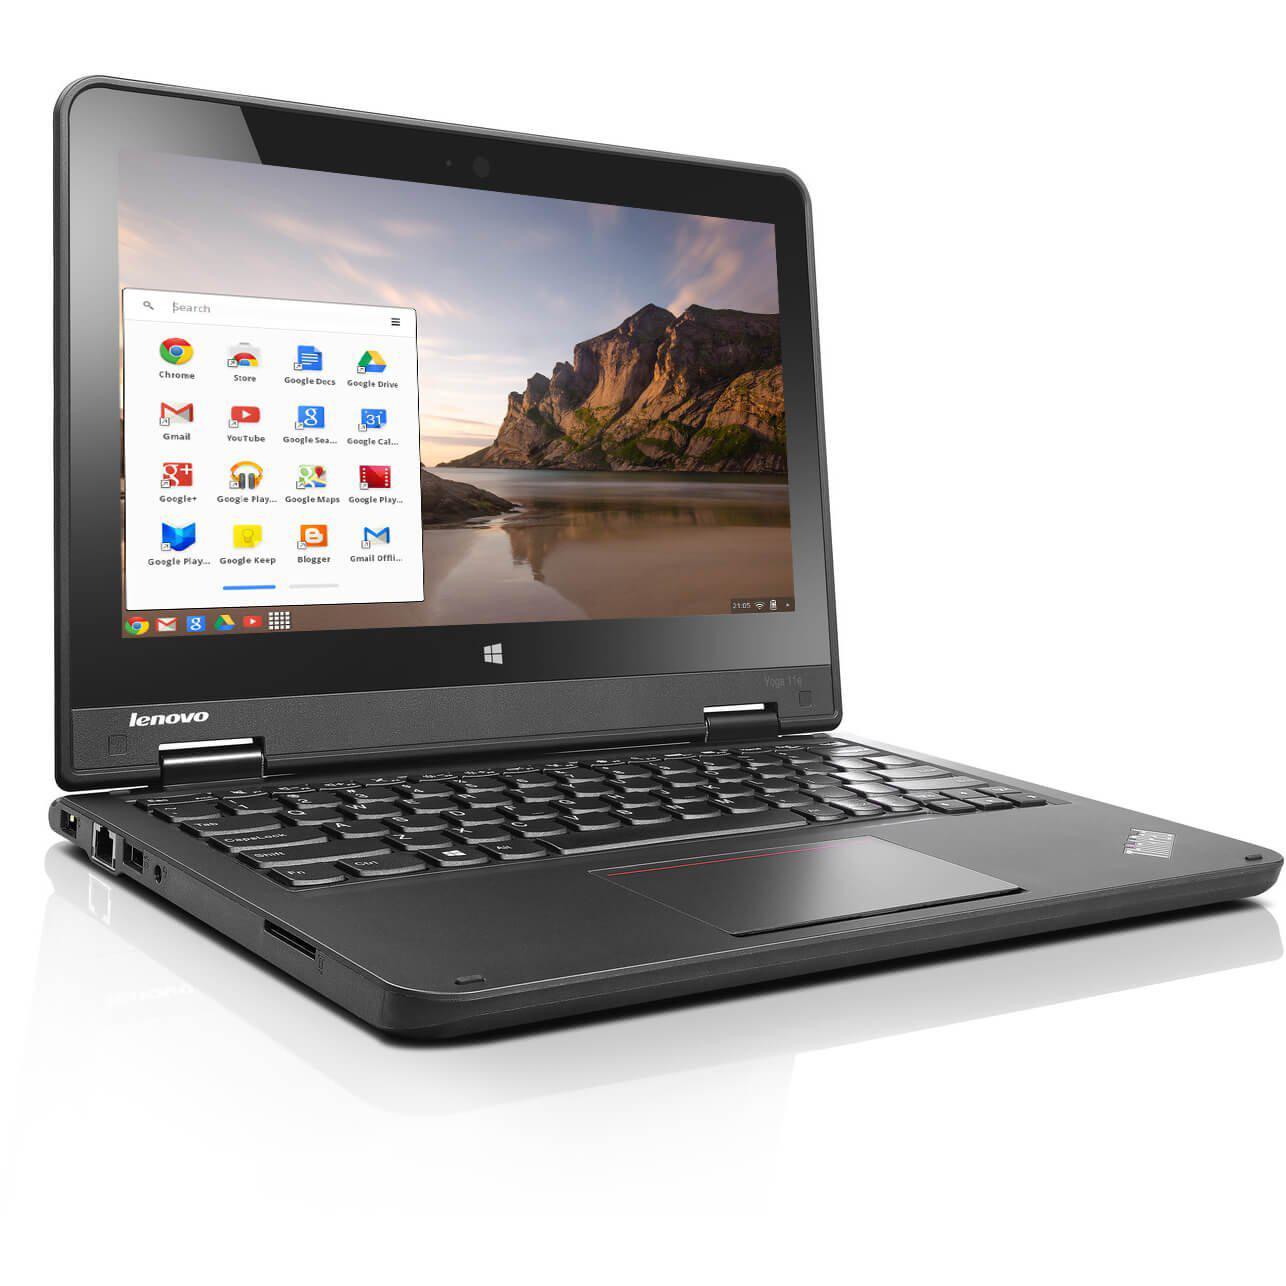 Lenovo ThinkPad 11E 11-inch (2015) - Celeron N2930 - 4 GB  - SSD 16 GB